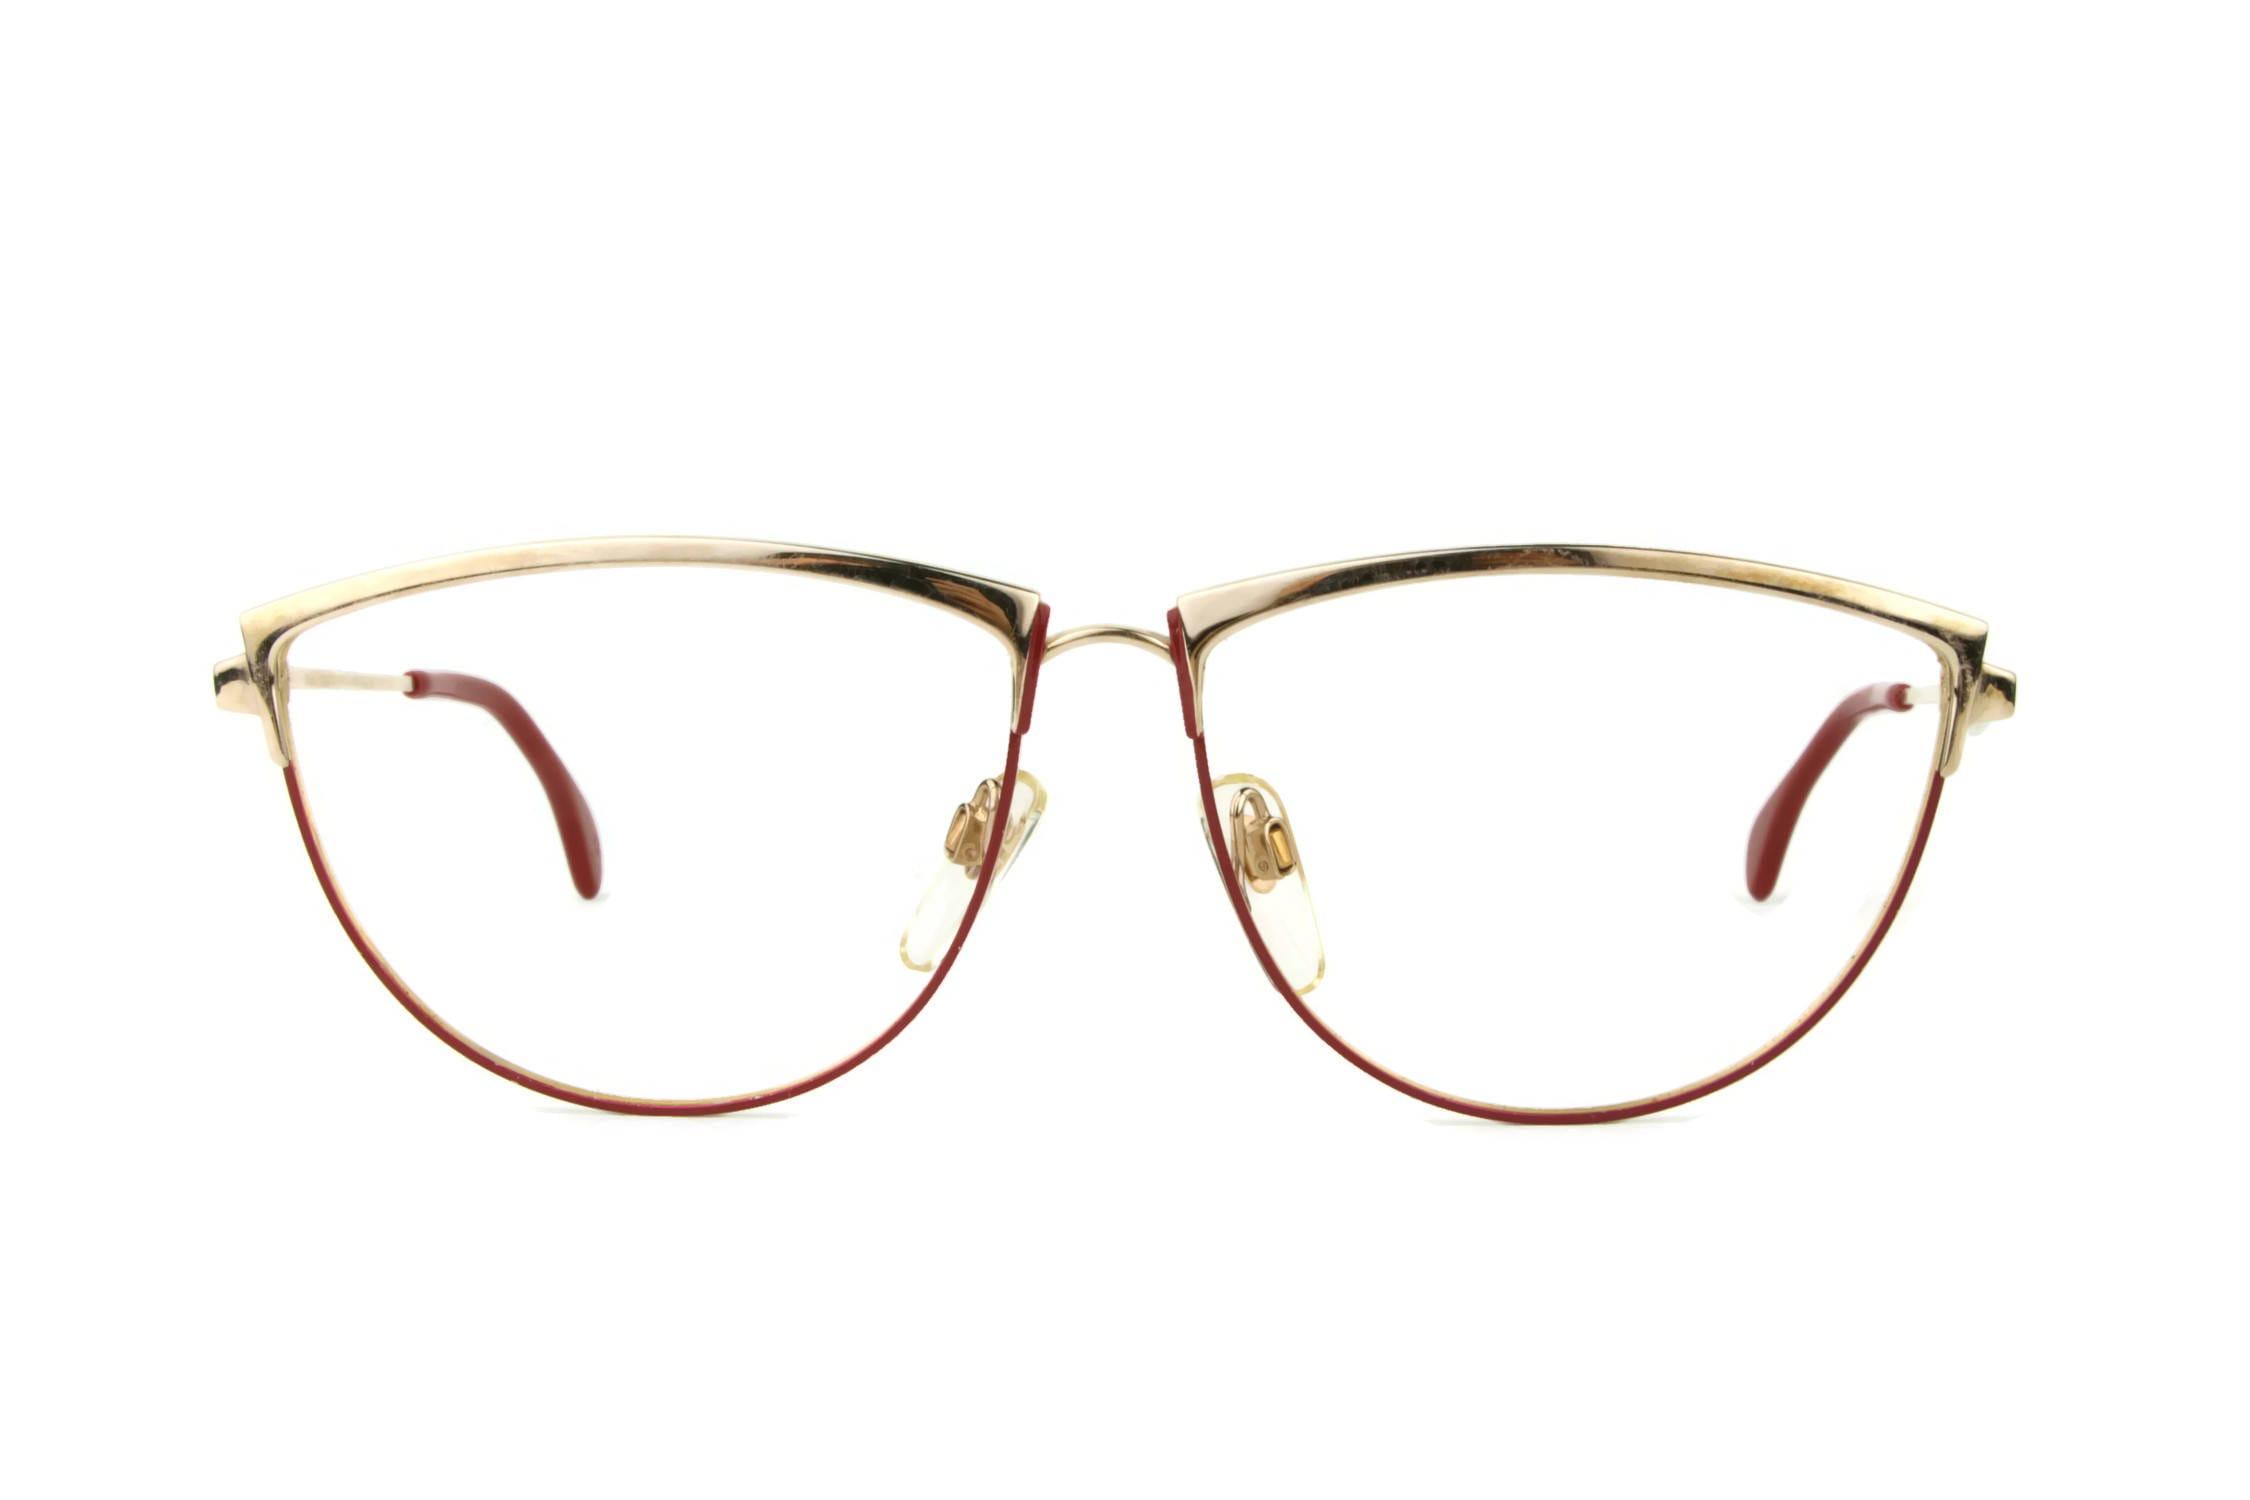 fc0fe14c1e Mondi Frame Germany round glasses panto vintage gold red true vintage  statement eyewear hipster frame eyeglasses